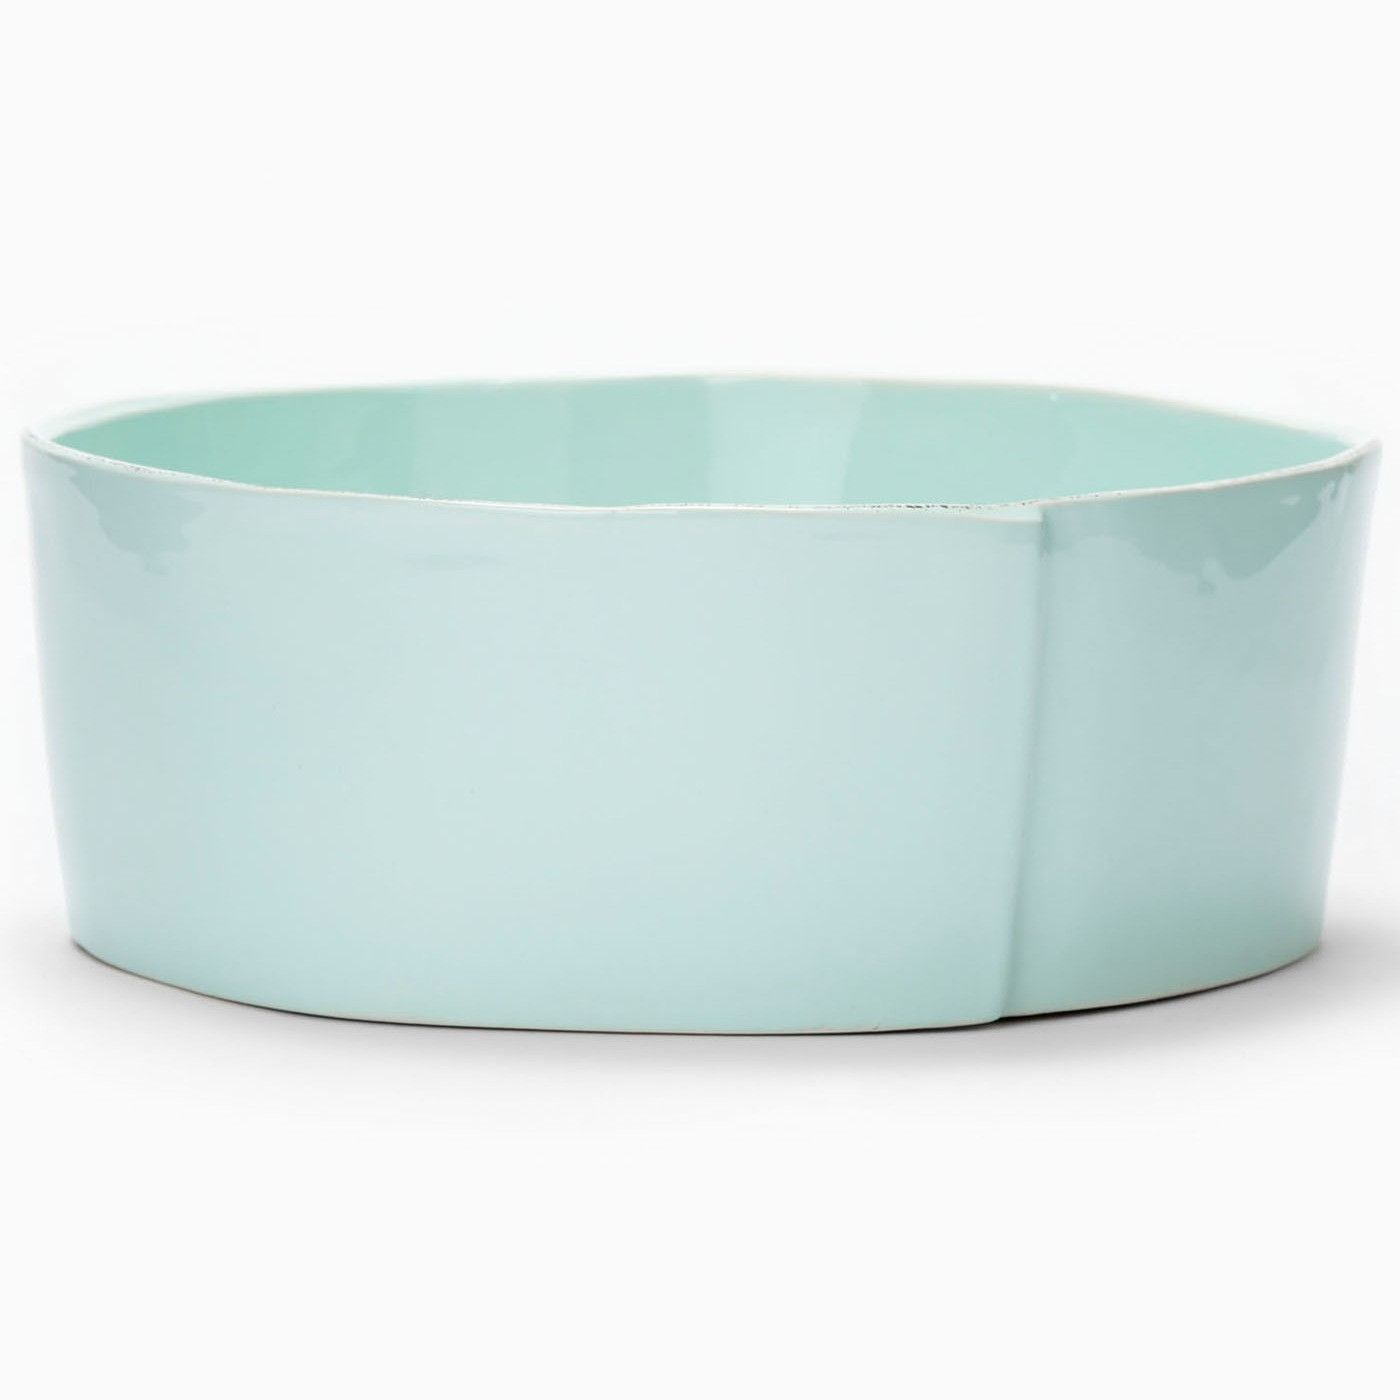 Vietri Lastra Large Serving Bowl